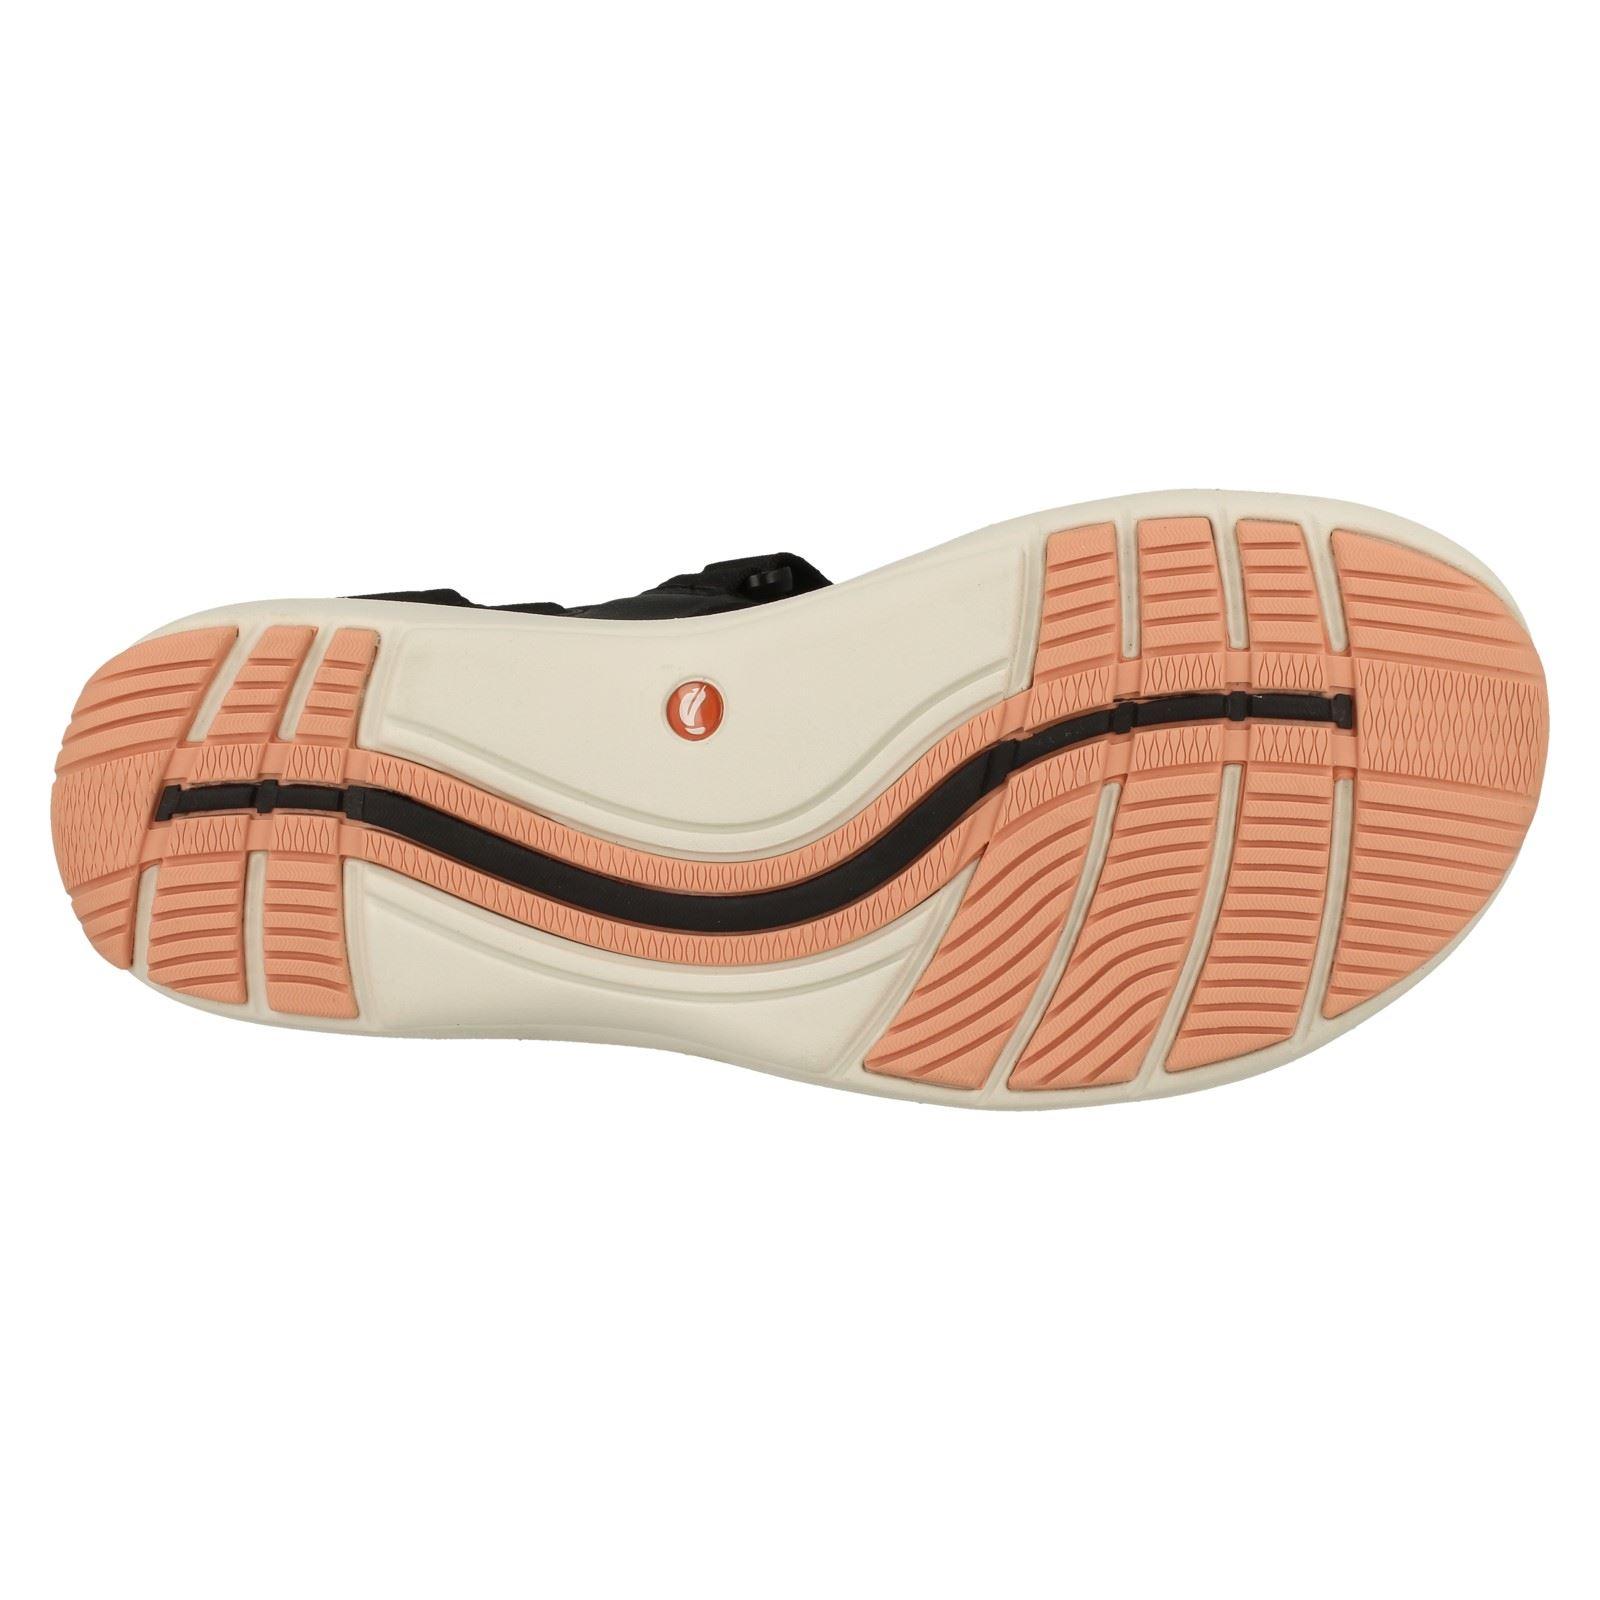 Ladies Clarks Sports Sandals *Un Roam Step*